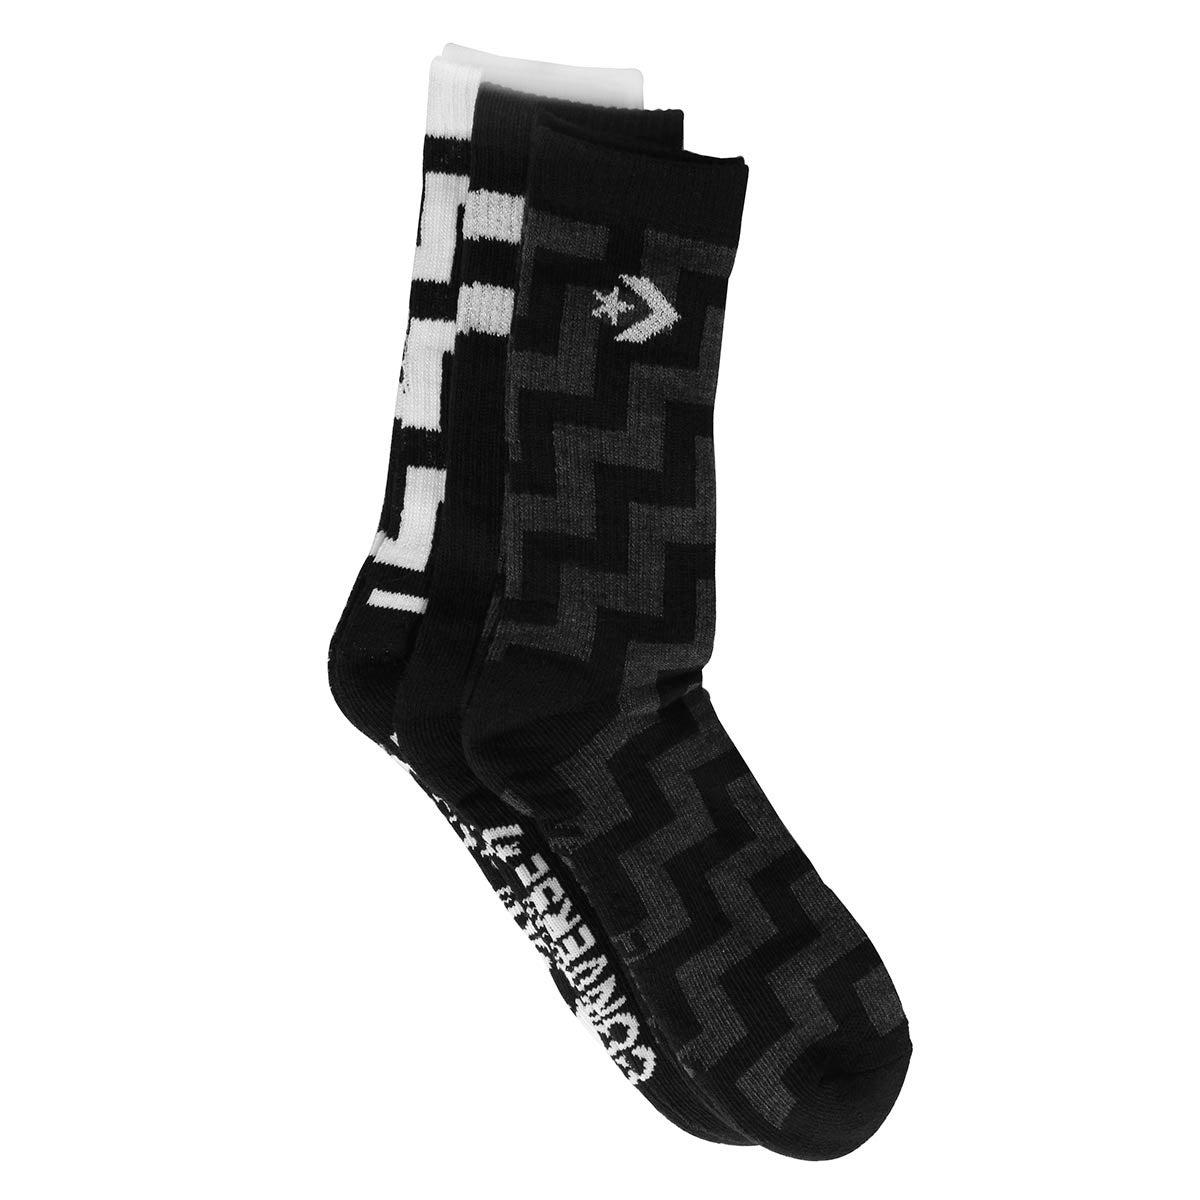 Women's CREW ZIG ZAG black socks - 3 pk